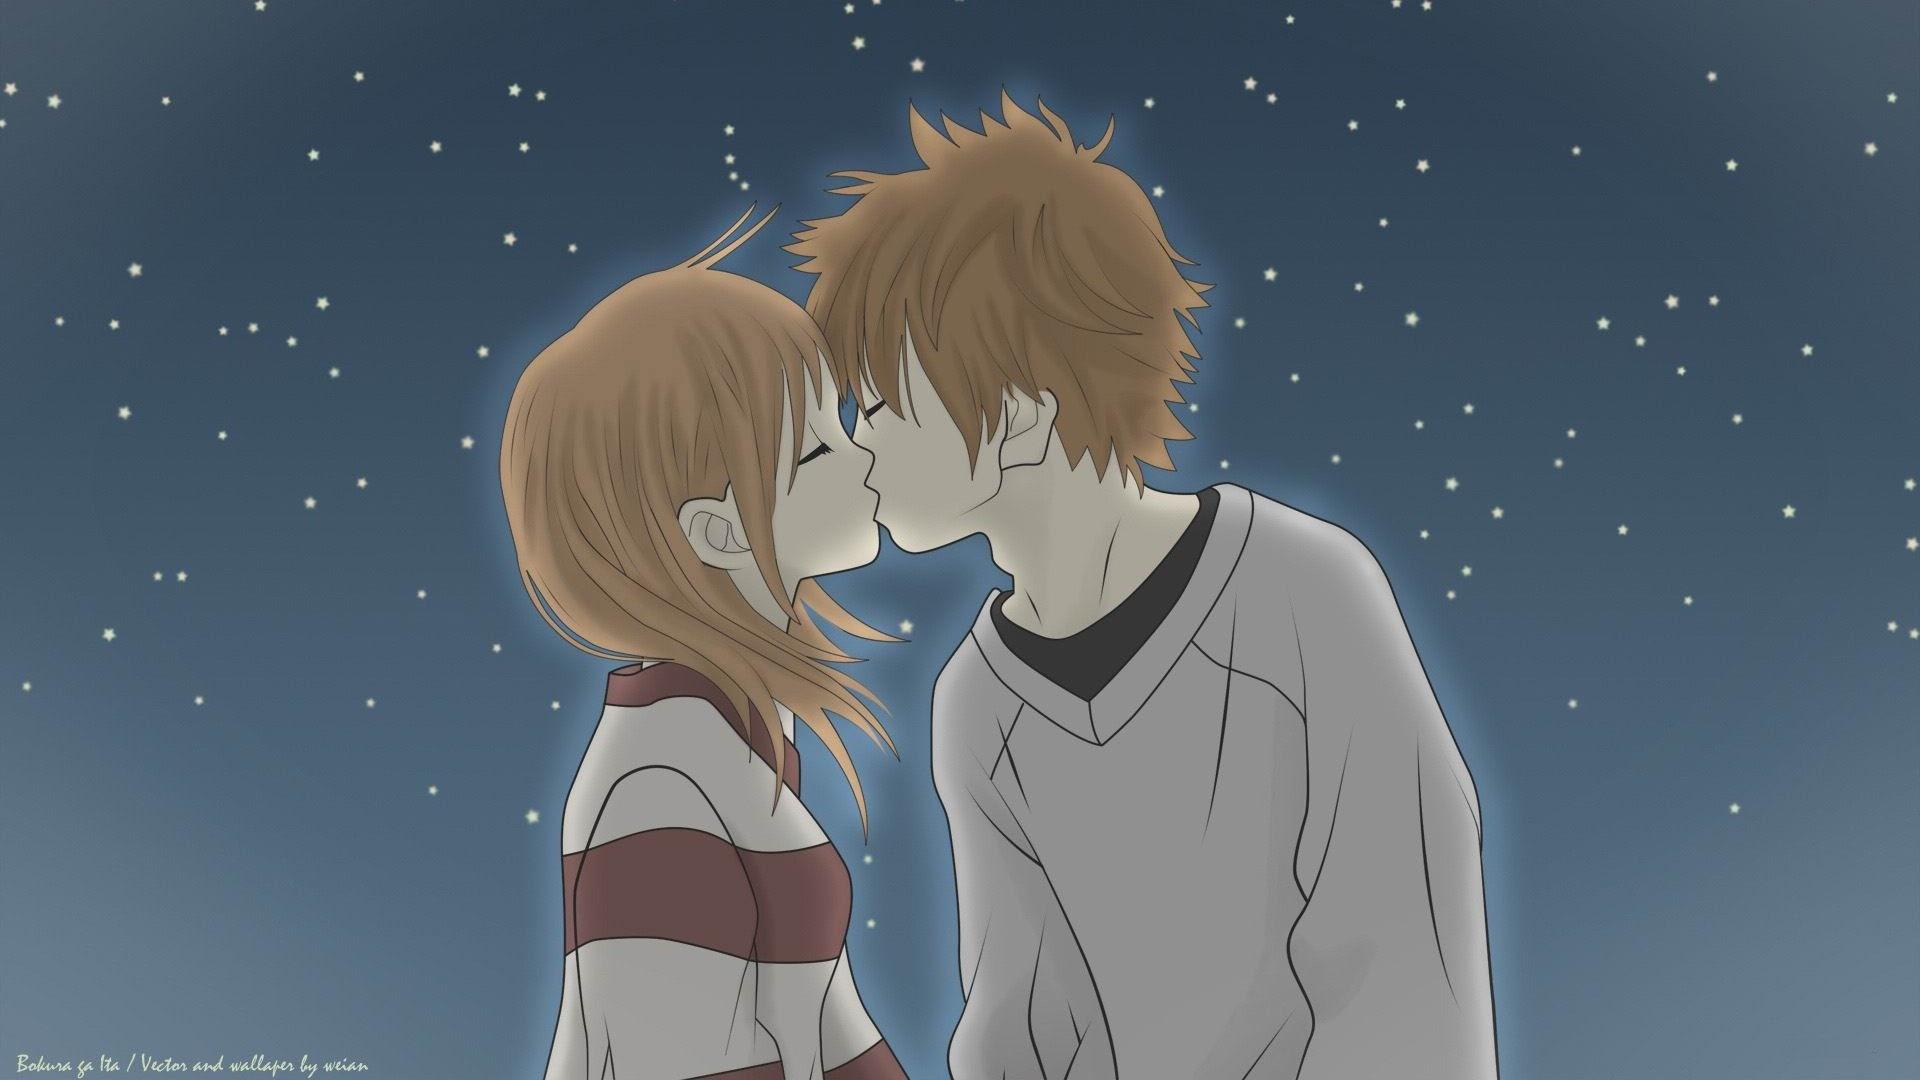 Anime Love Wallpaper 78 Images